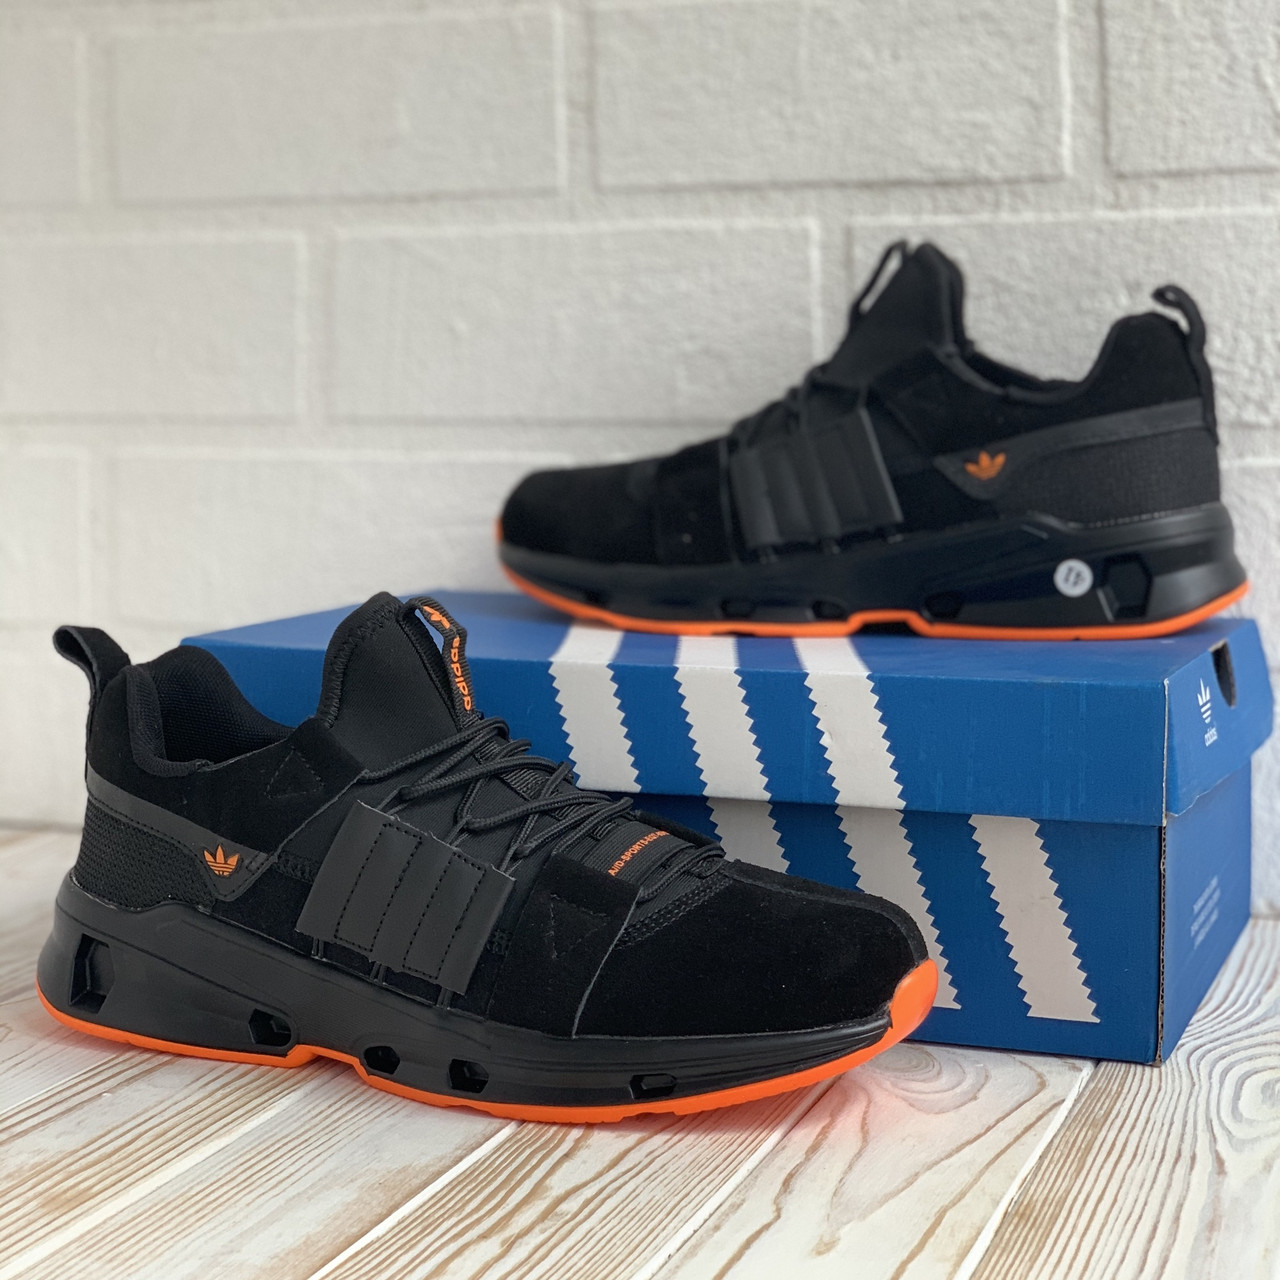 Equipment чорні кросівки | чоловічі кросівки, кеди 41-45р